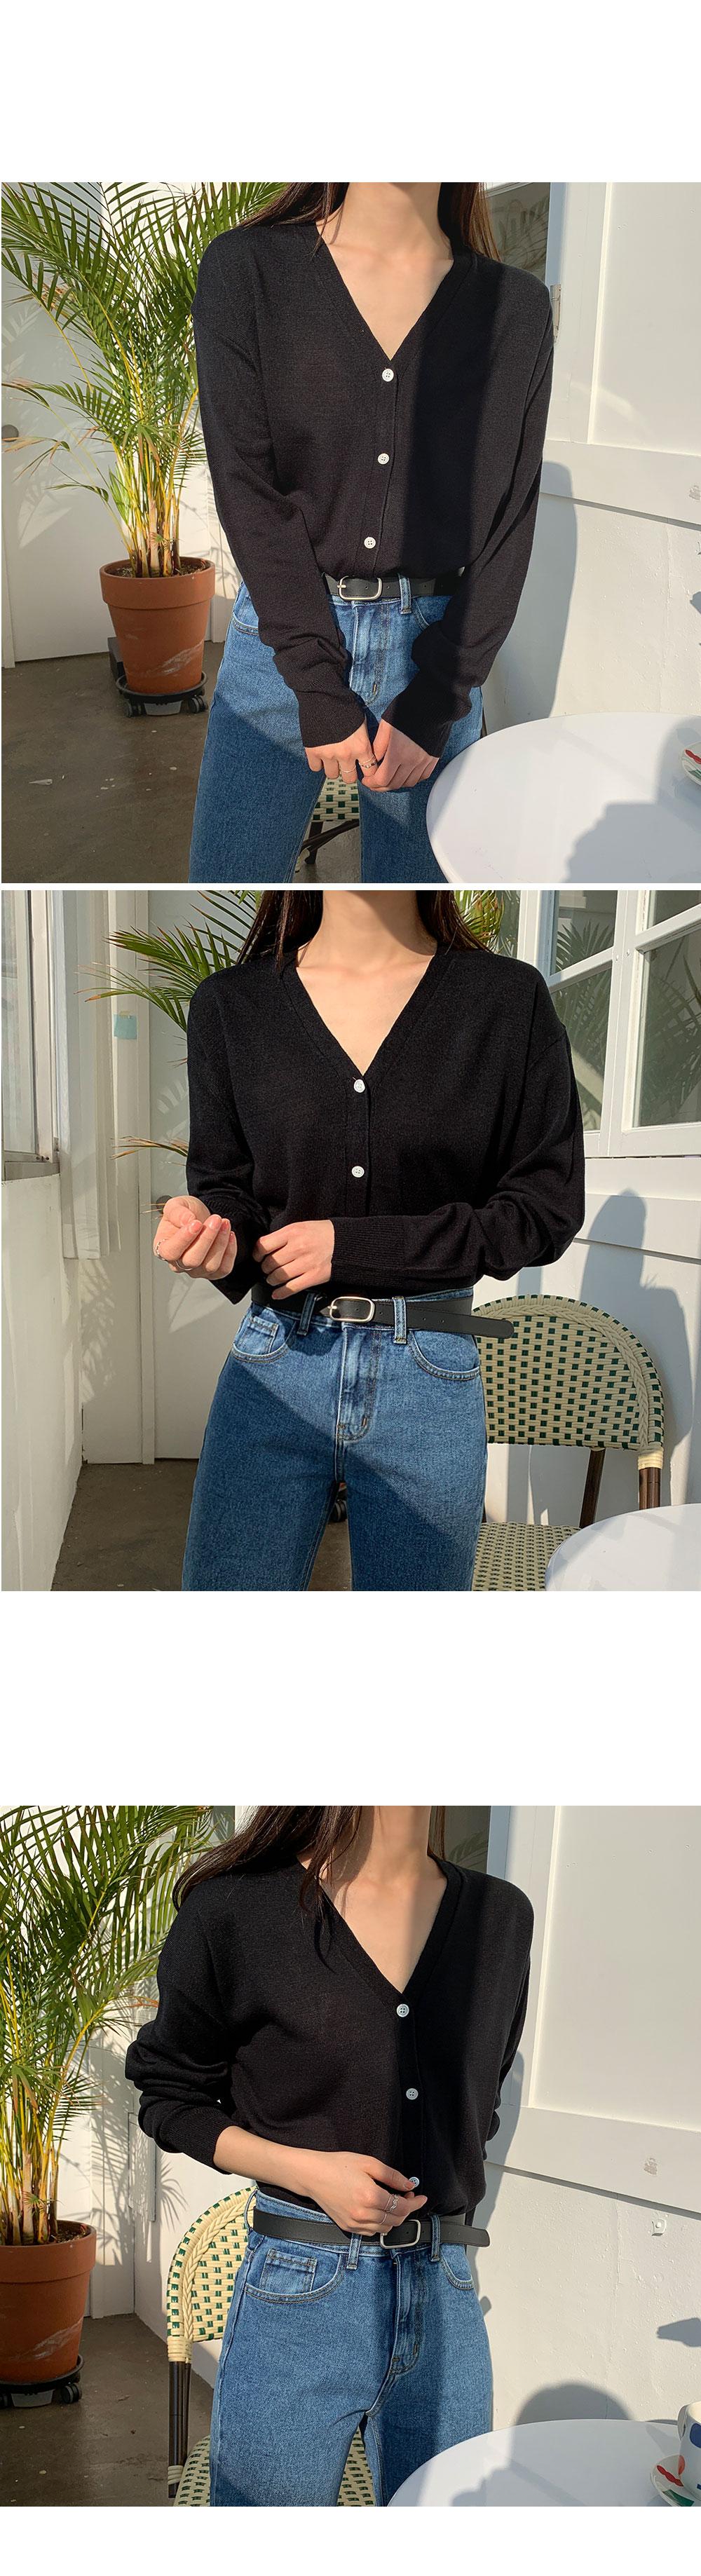 Mien V Neck Knit Cardigan-holiholic.com